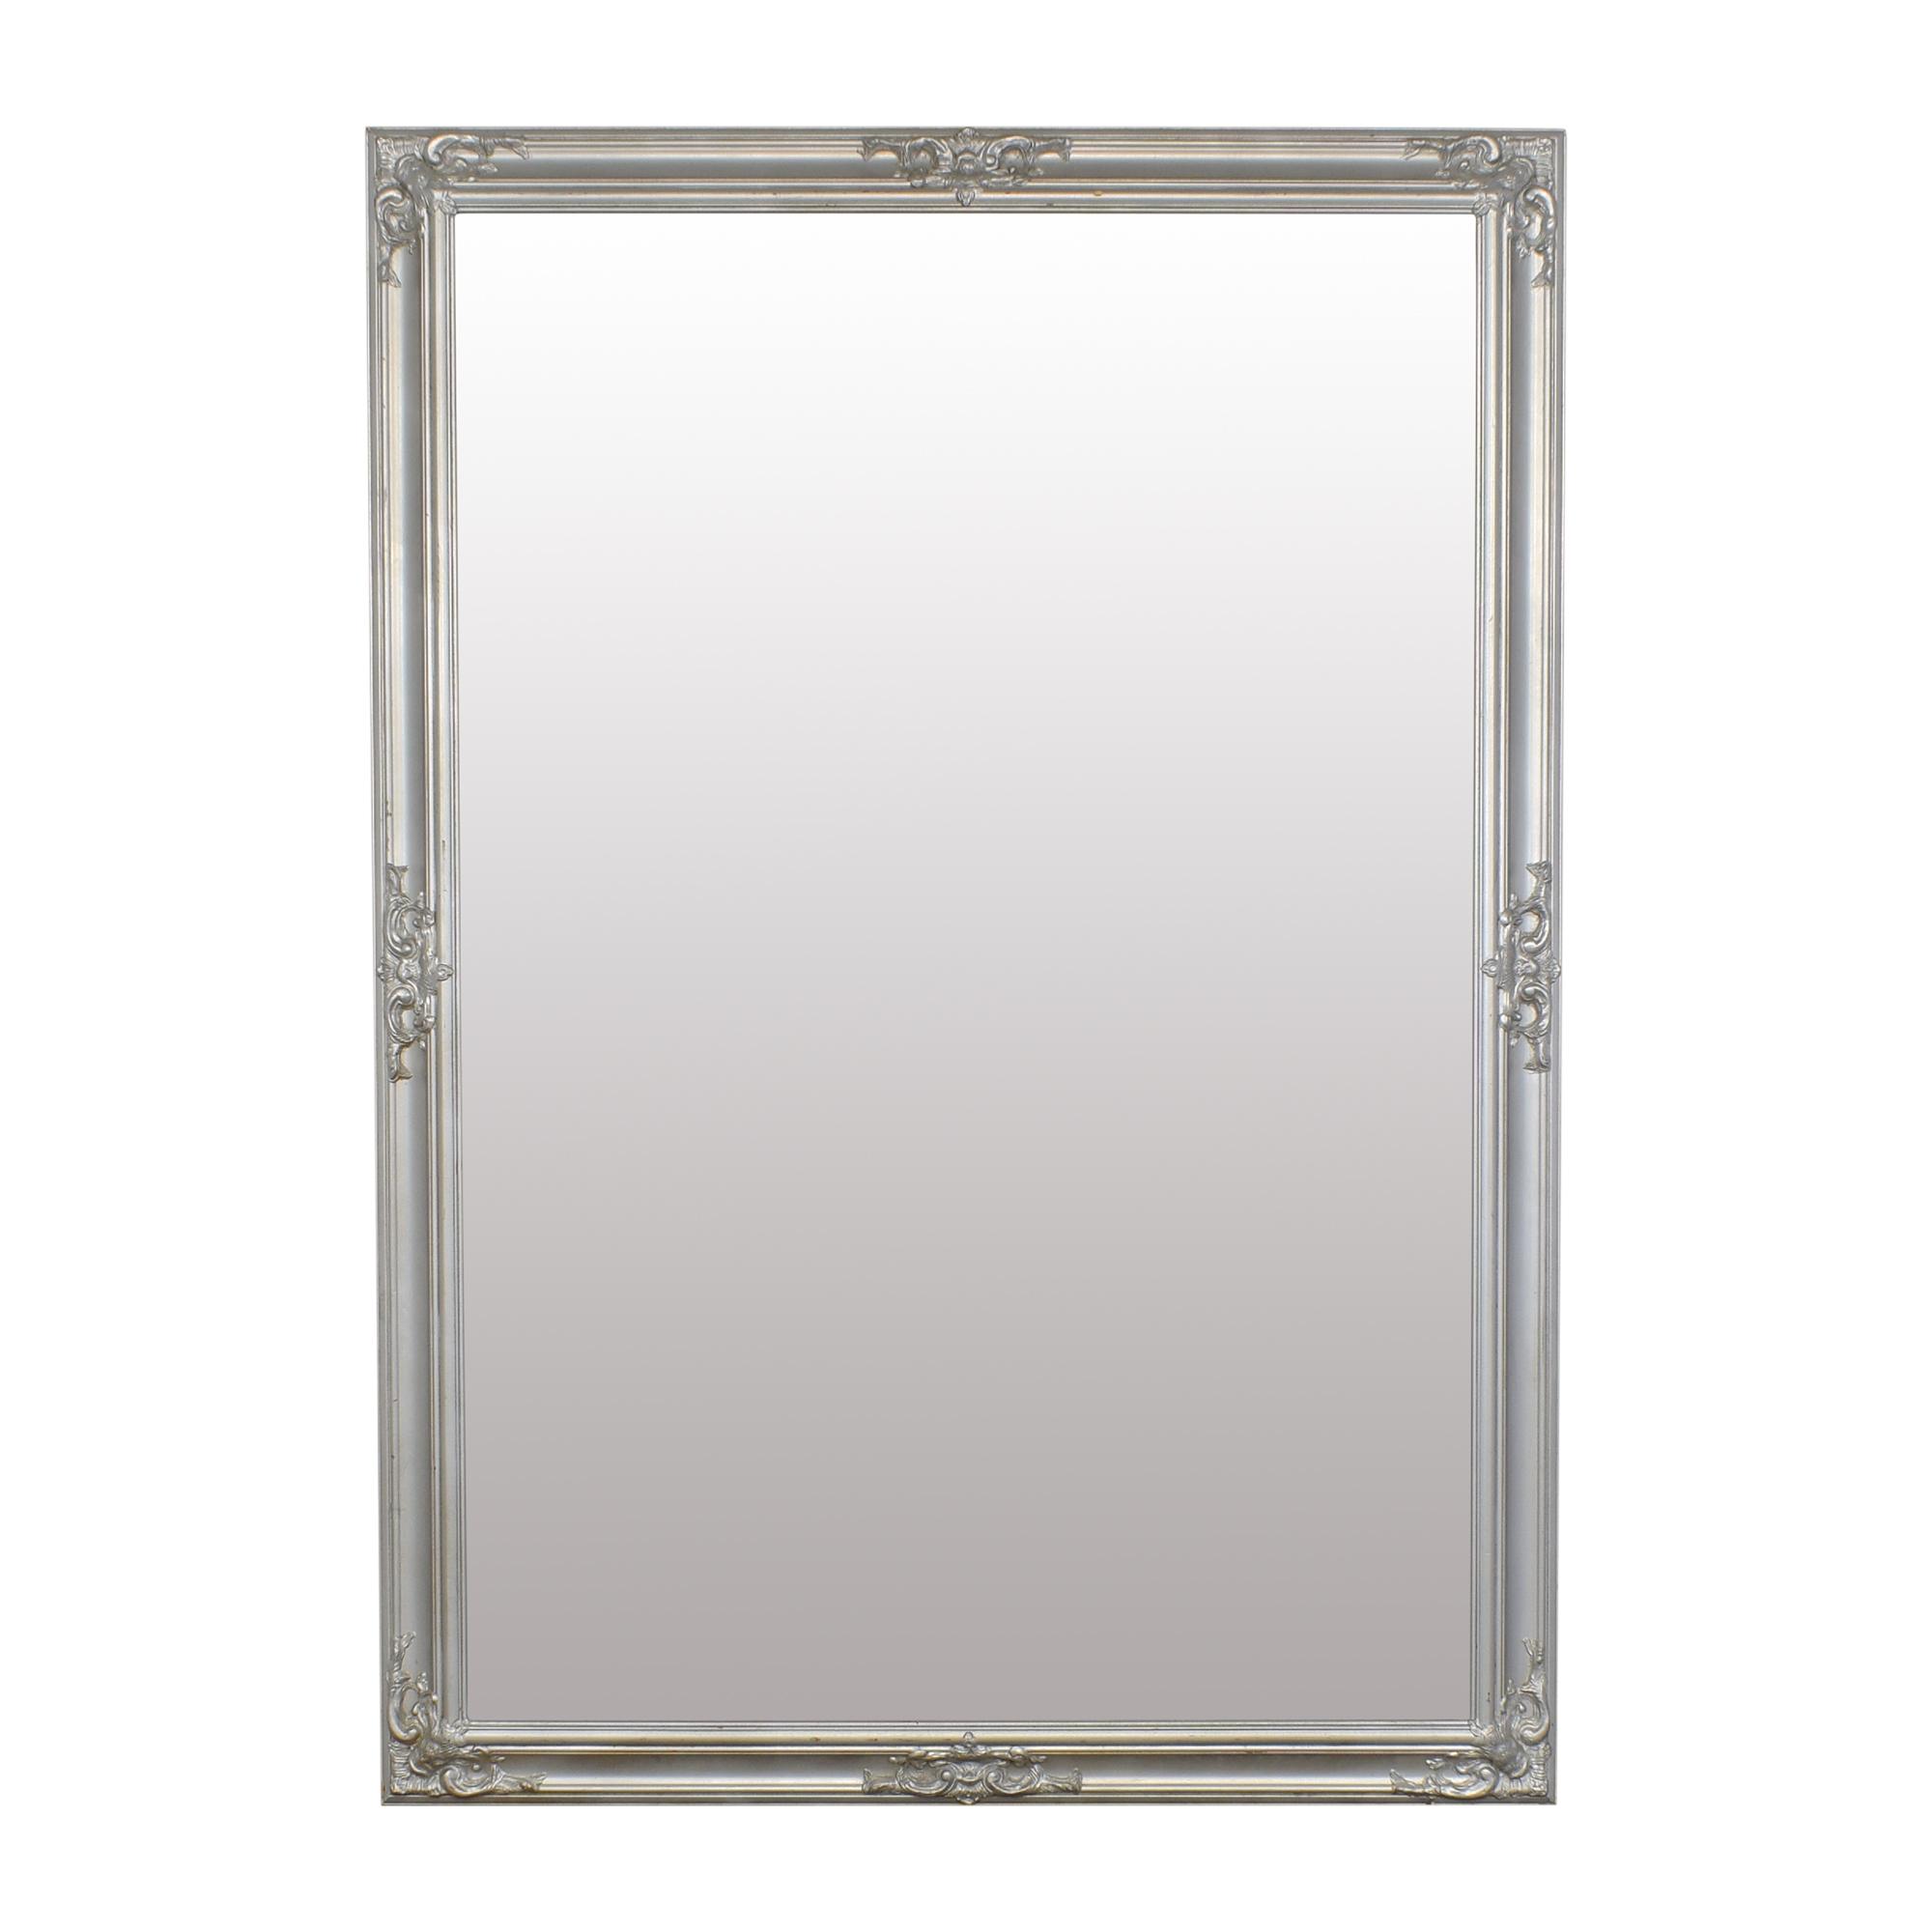 buy Decorative Framed Oversized Mirror  Decor